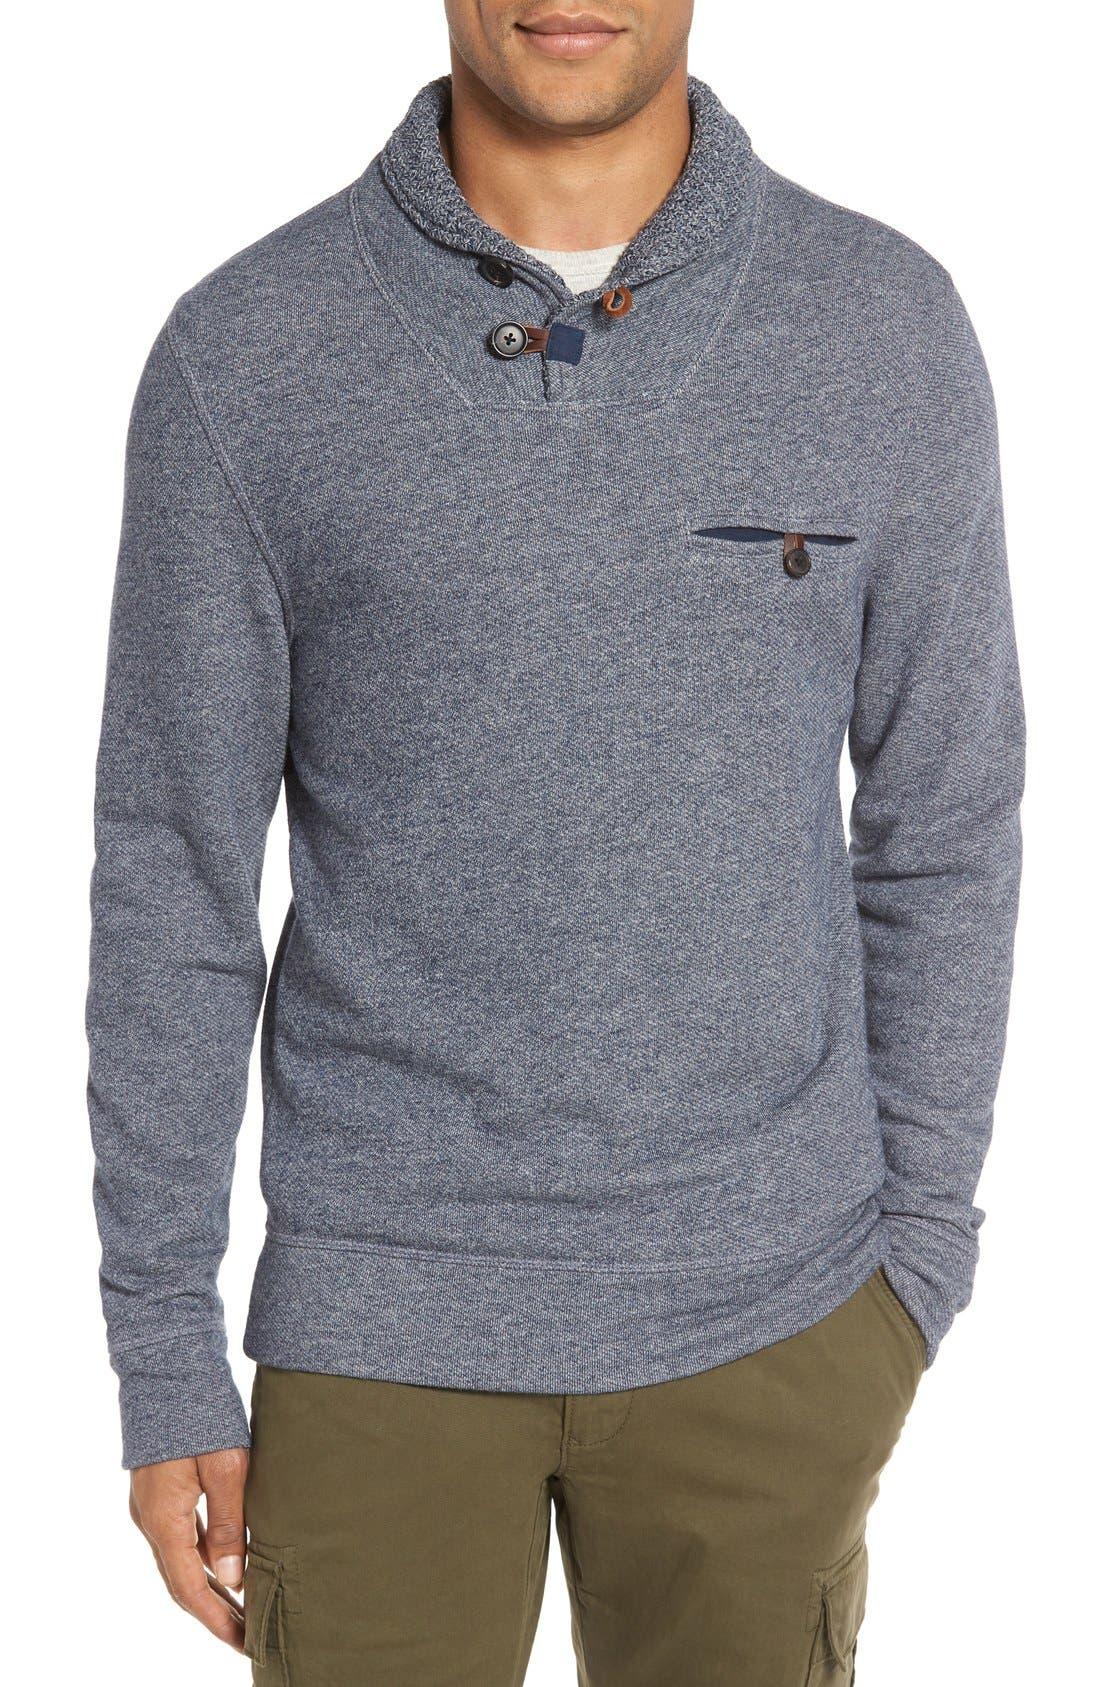 Alternate Image 1 Selected - Billy Reid 'Shiloh' Shawl Collar Sweatshirt